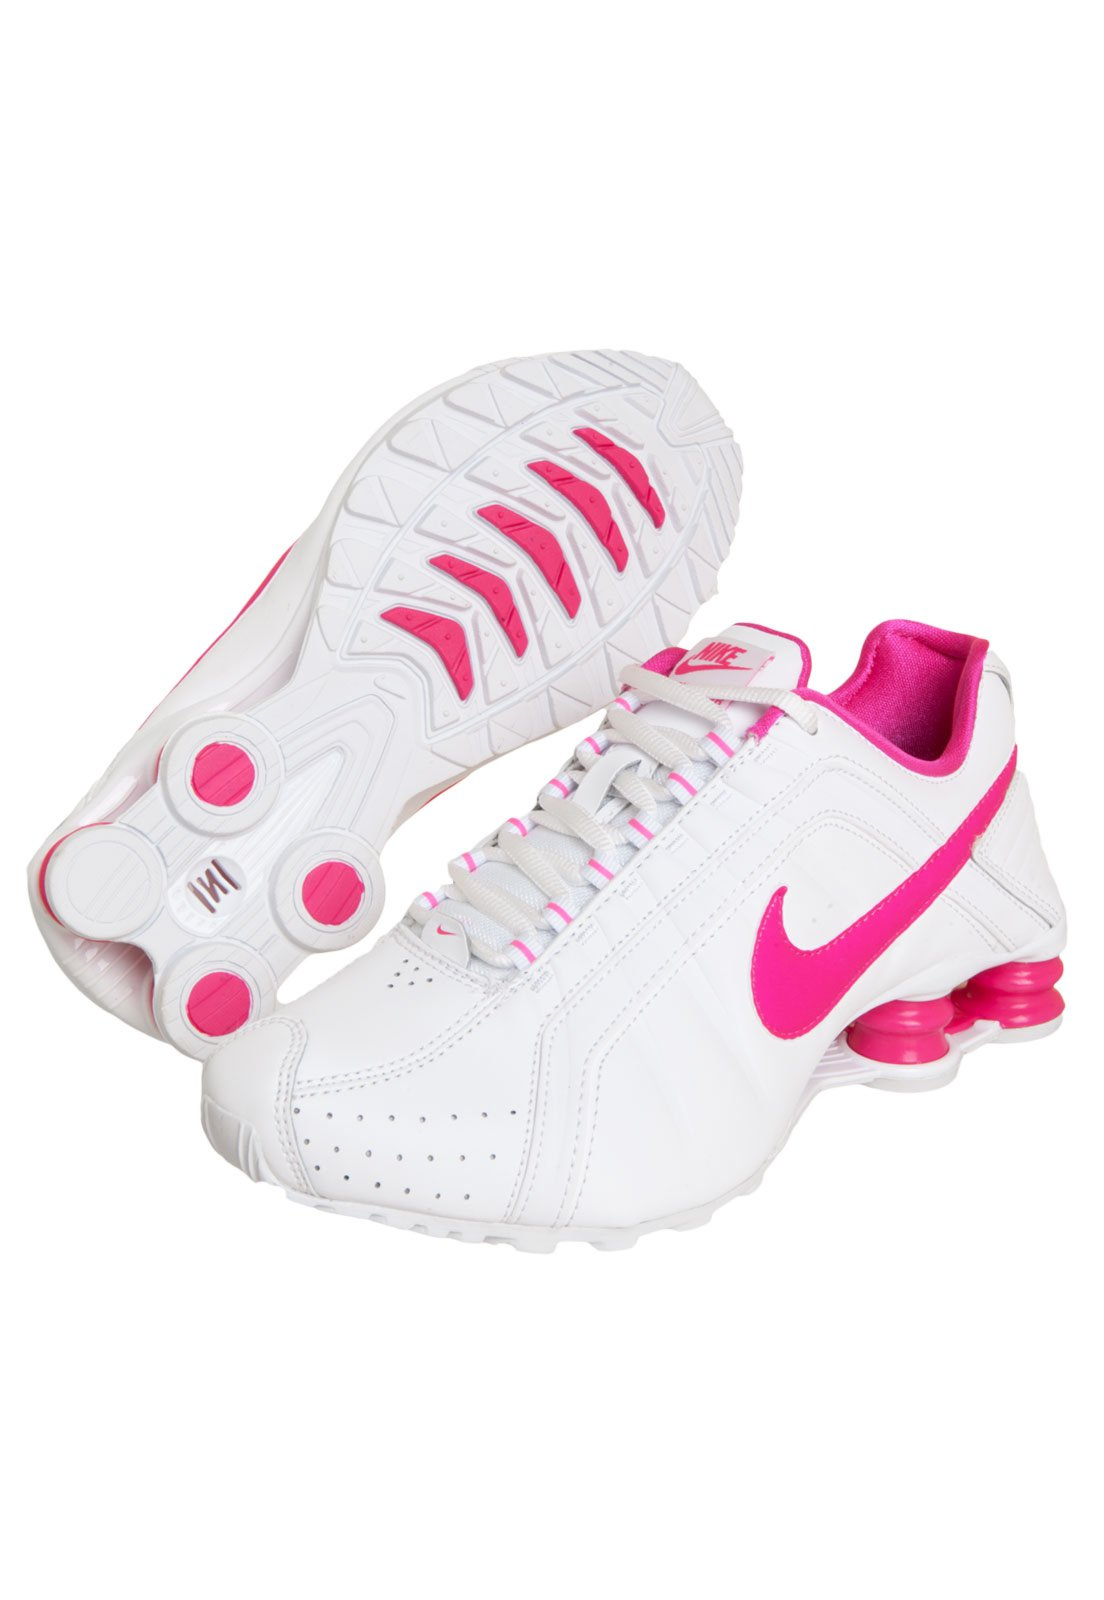 nike shox junior feminino branco e rosa